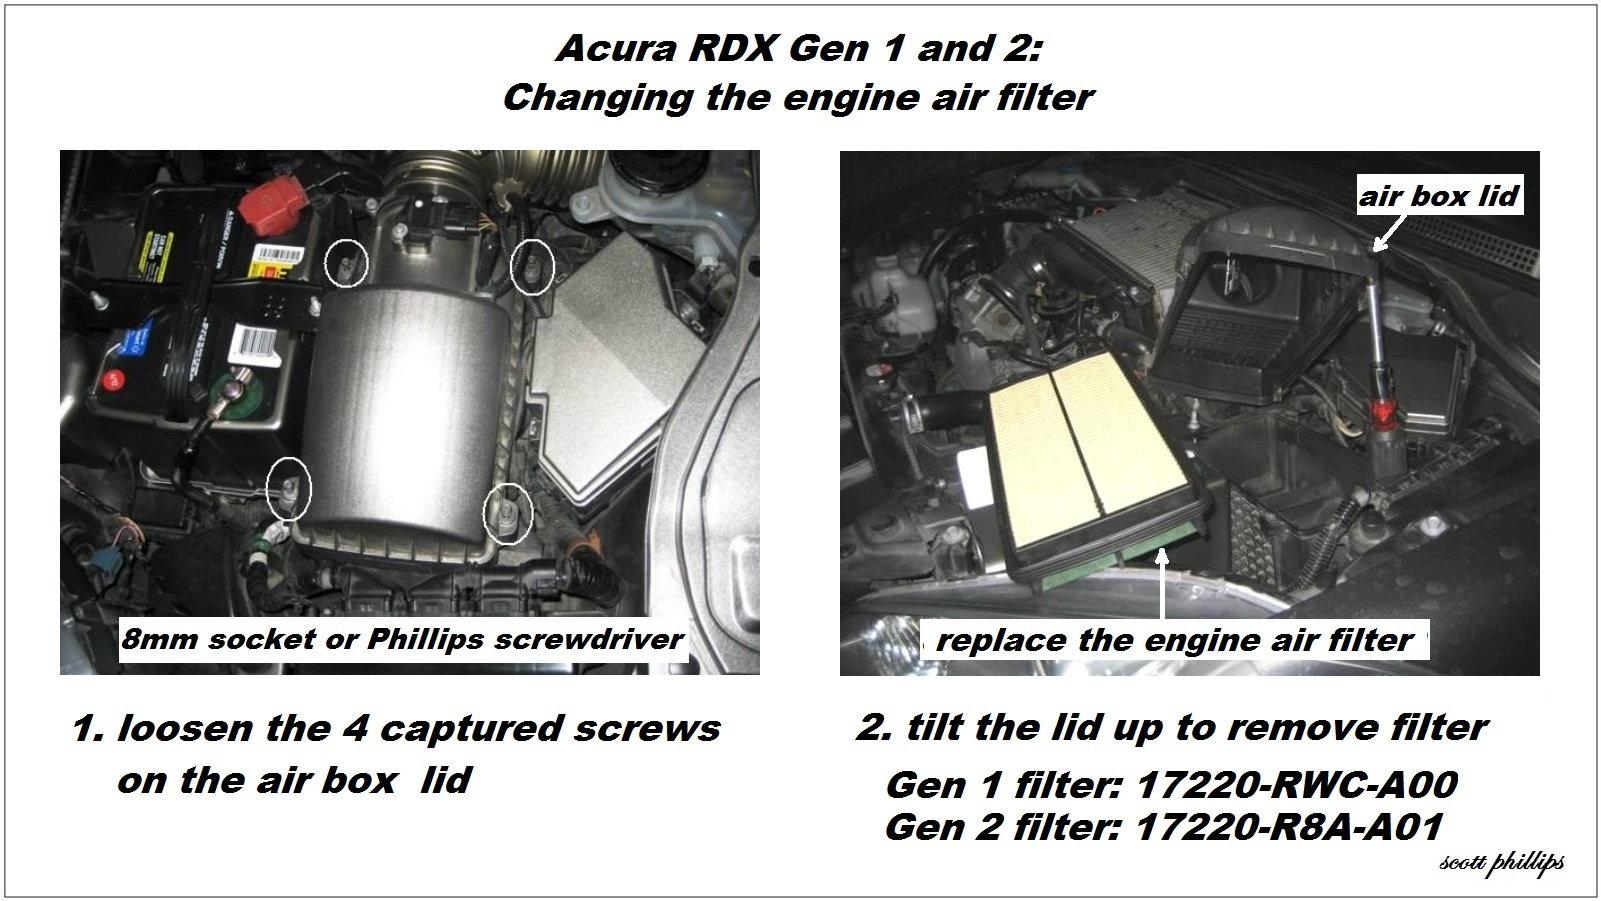 Acura Rdx Engine Noise Diagnostic Guide Acurazine 2007 Diagram Mdx Tl K23 Turbo J35 V6 Sound Problem Issue Diagnose